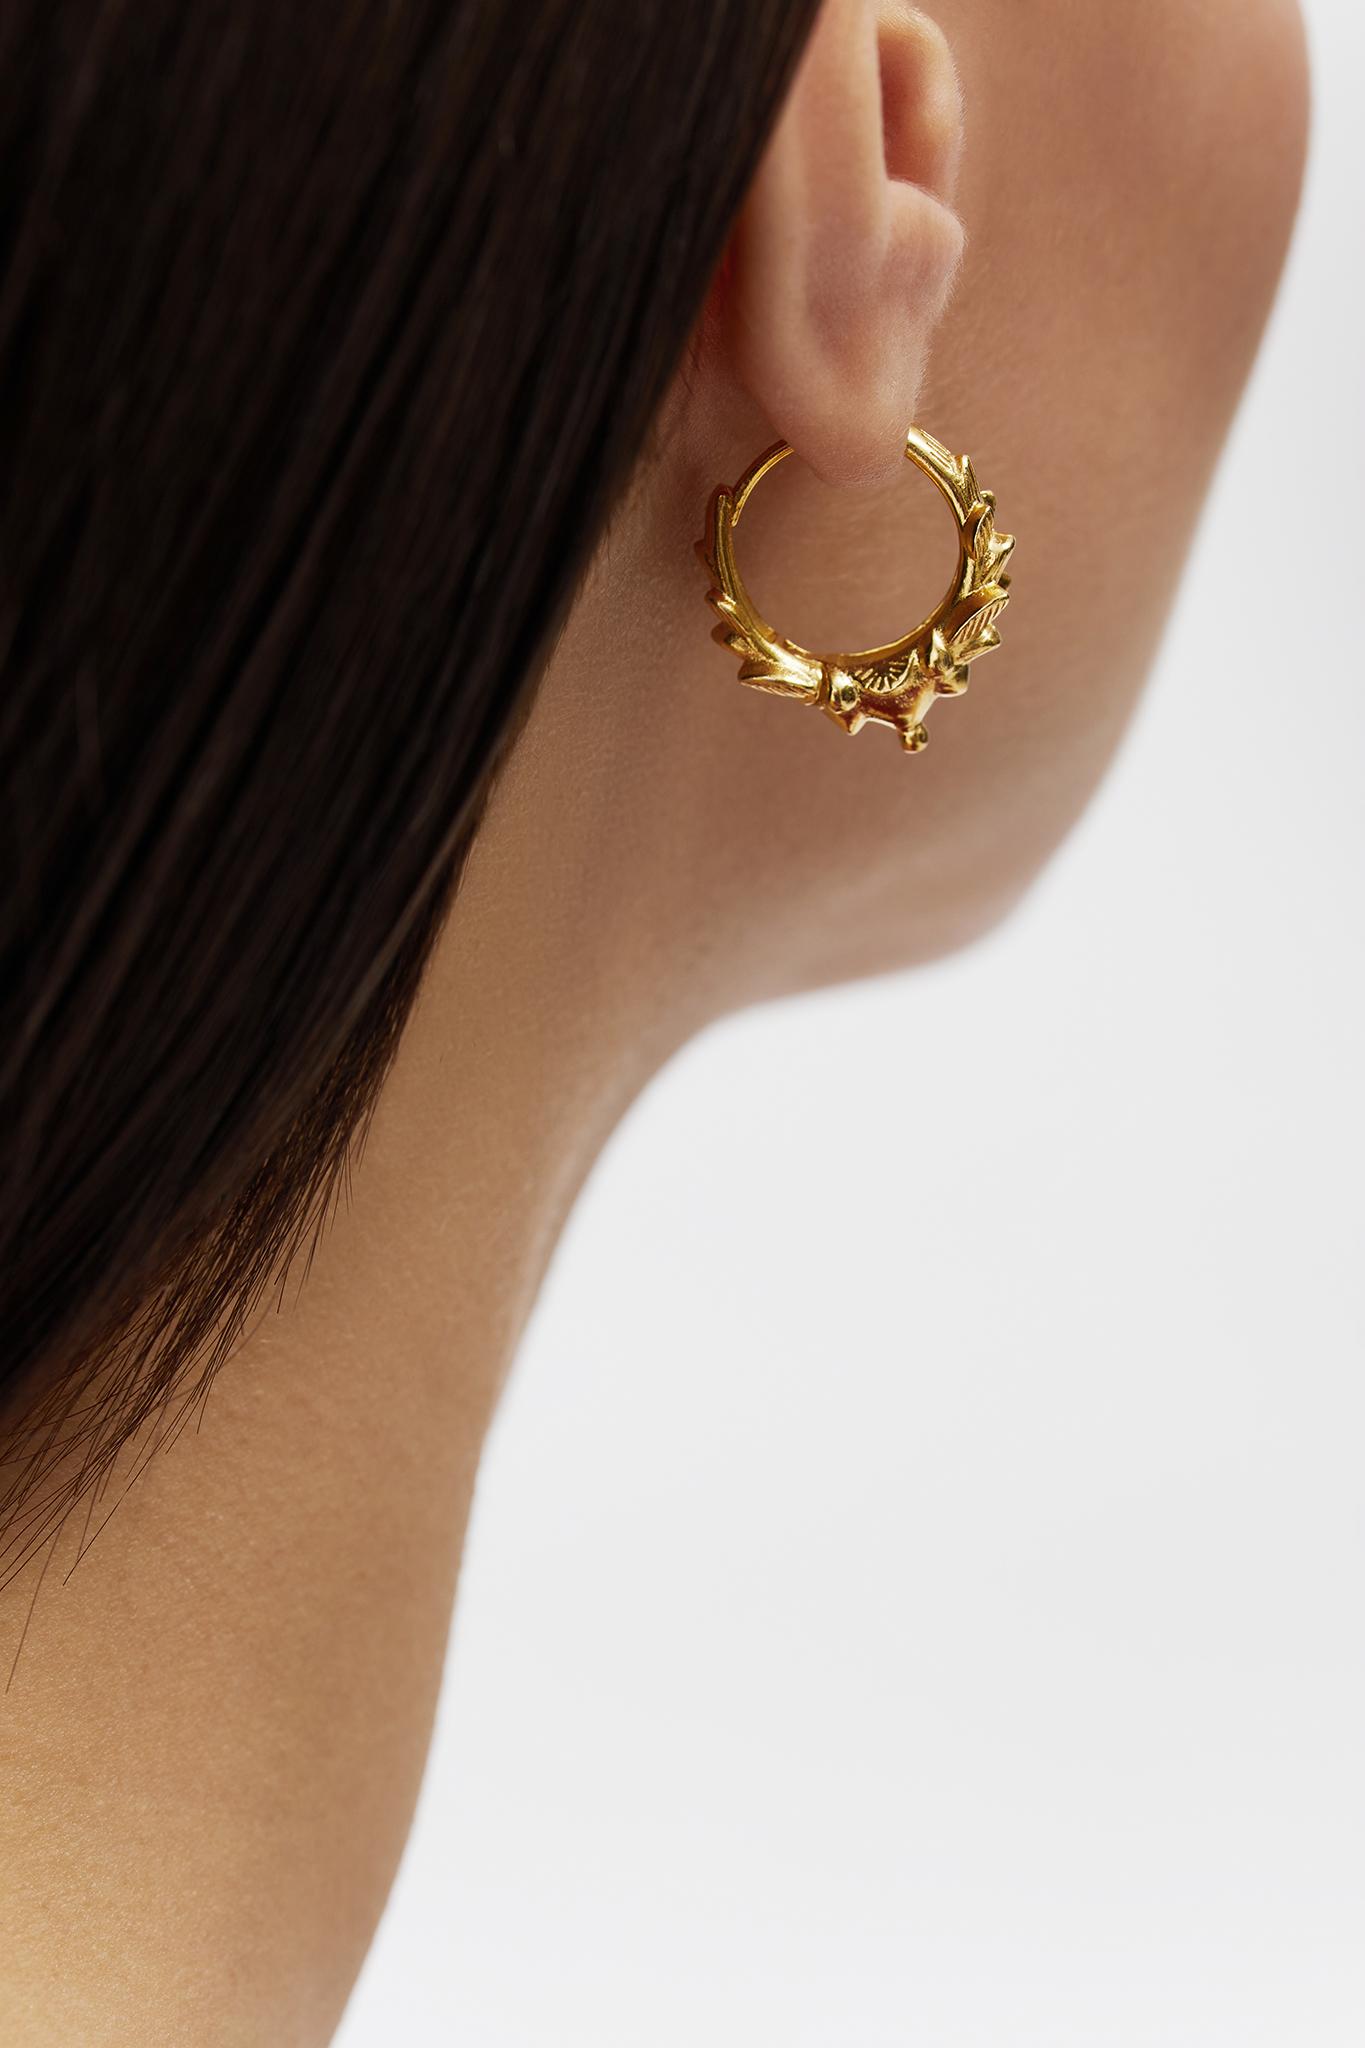 Blameyourdaze hoop earrings gold